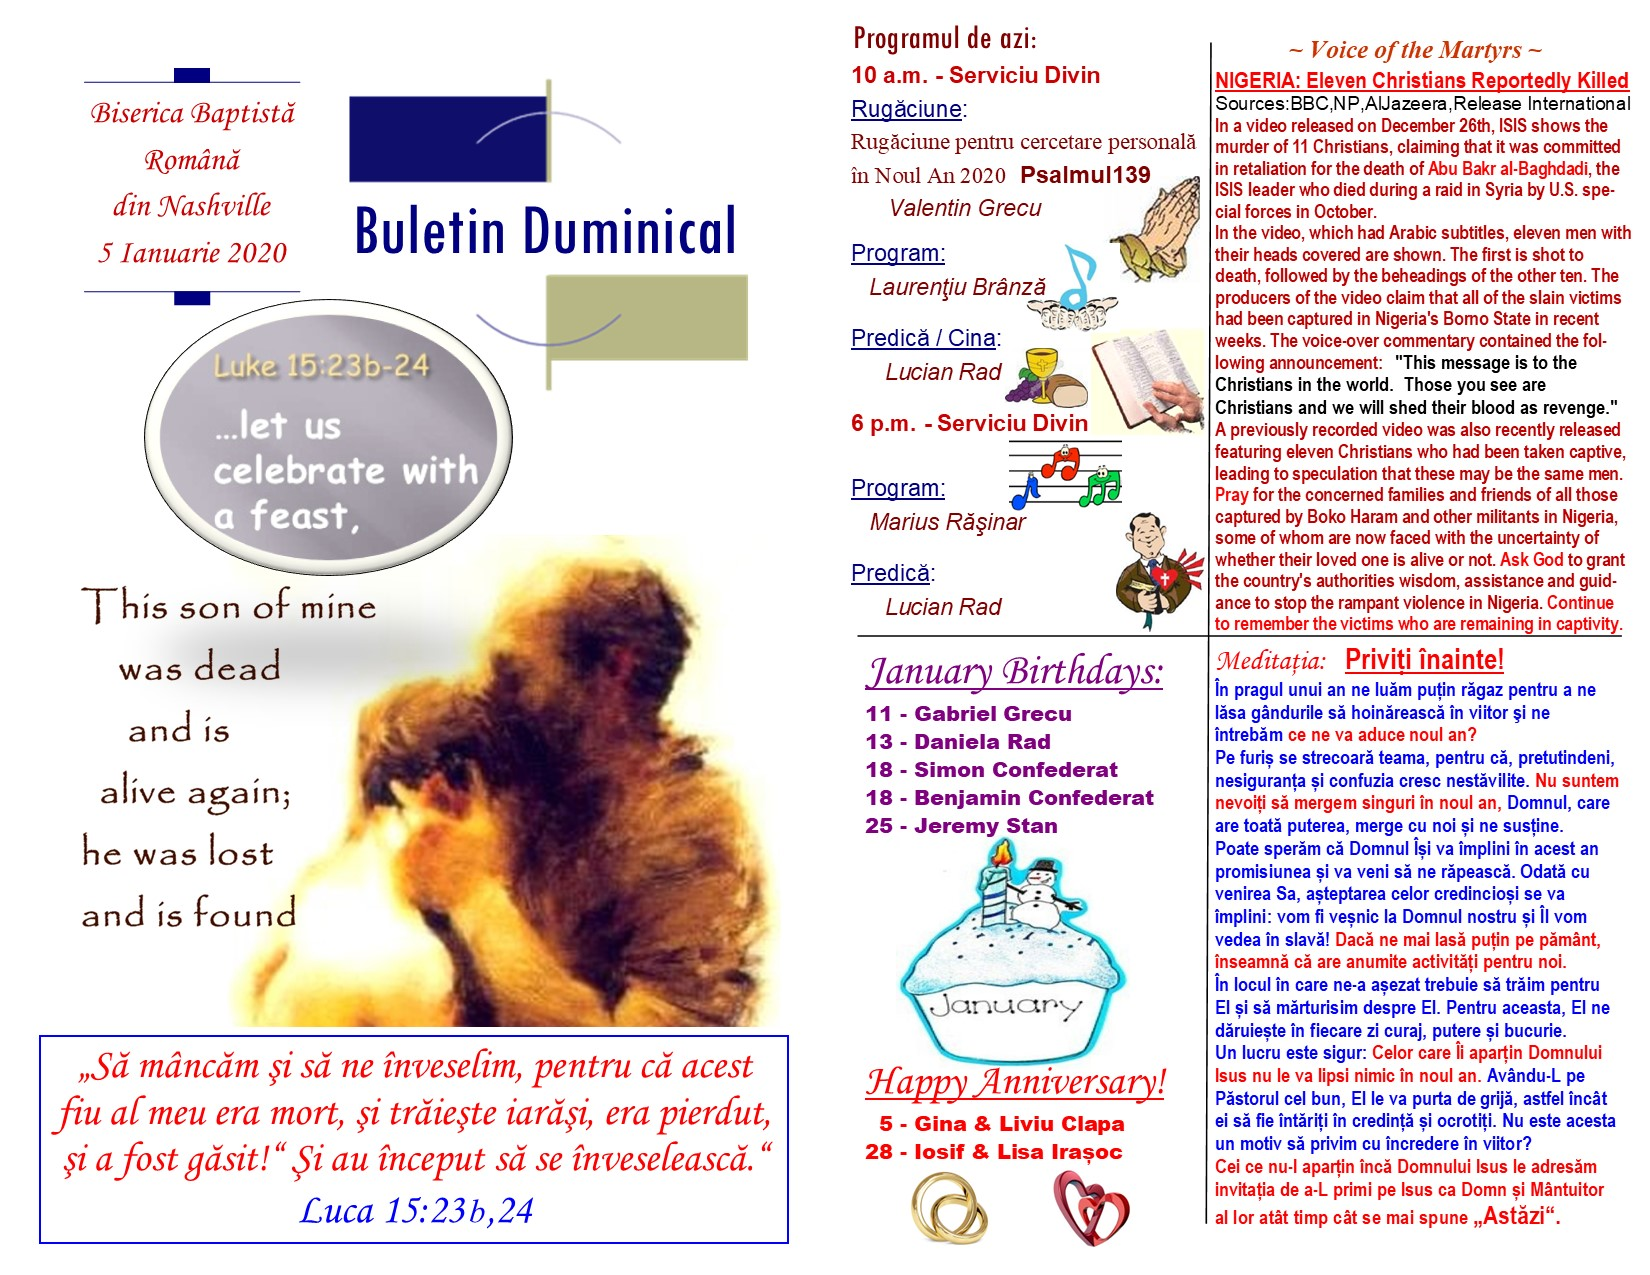 Buletin 01-05-20 page 1 & 2